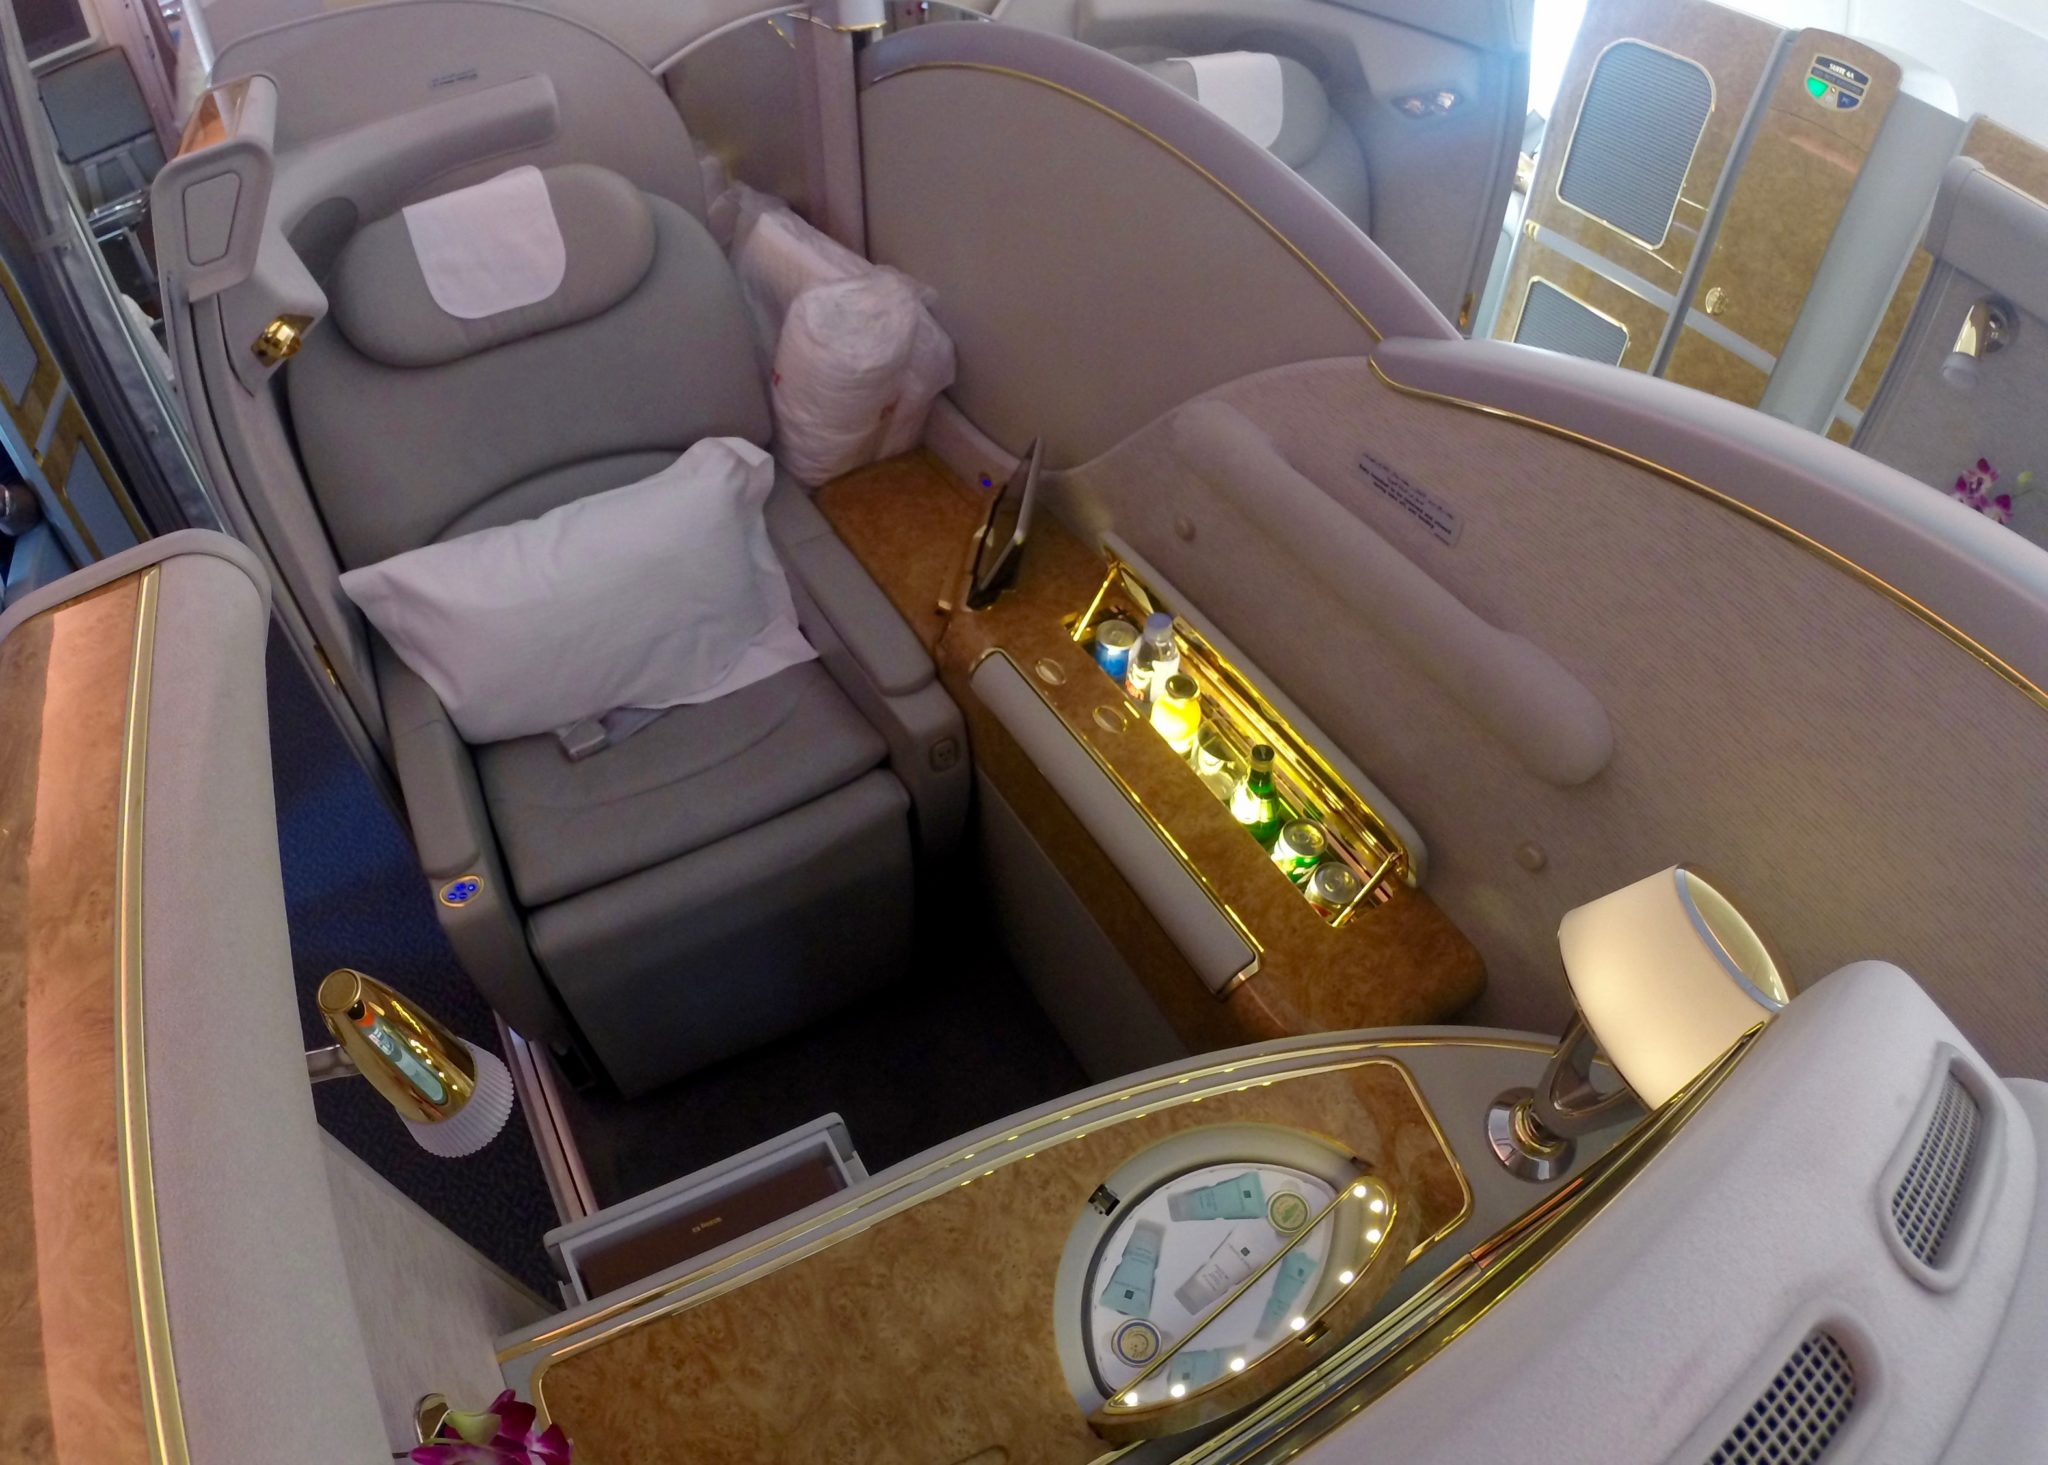 Emirates First Class A380 - Seat 2F